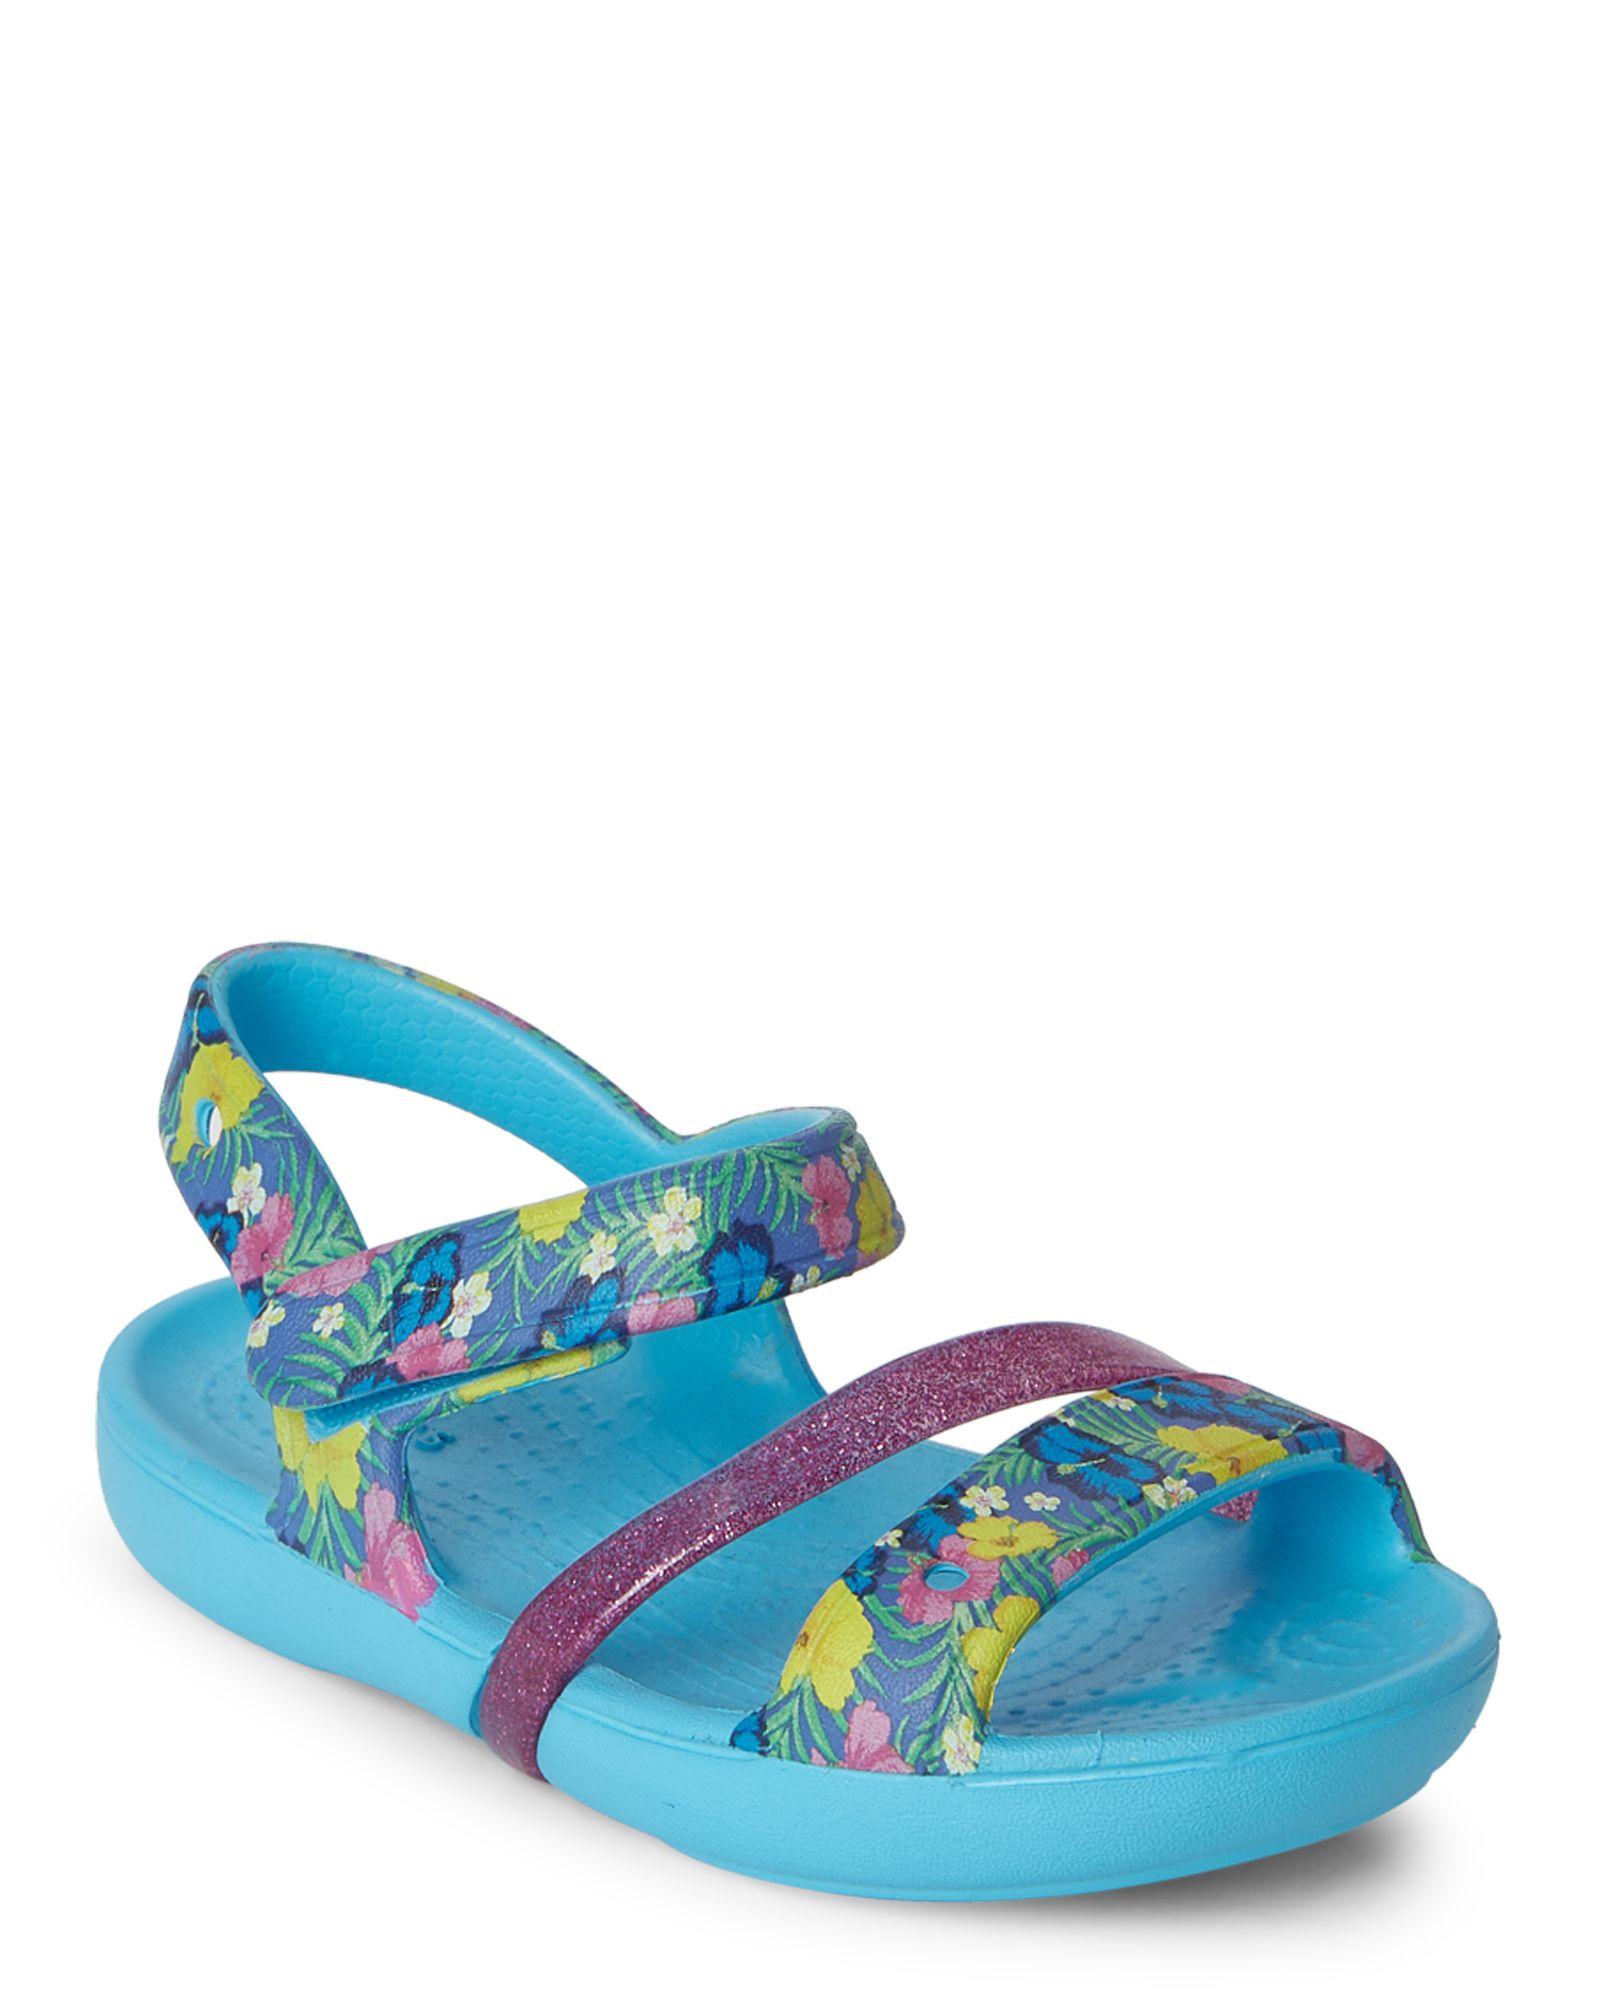 7f3dd08e3 Crocs (Toddler Kids Girls) Electric Blue Lina Sandals